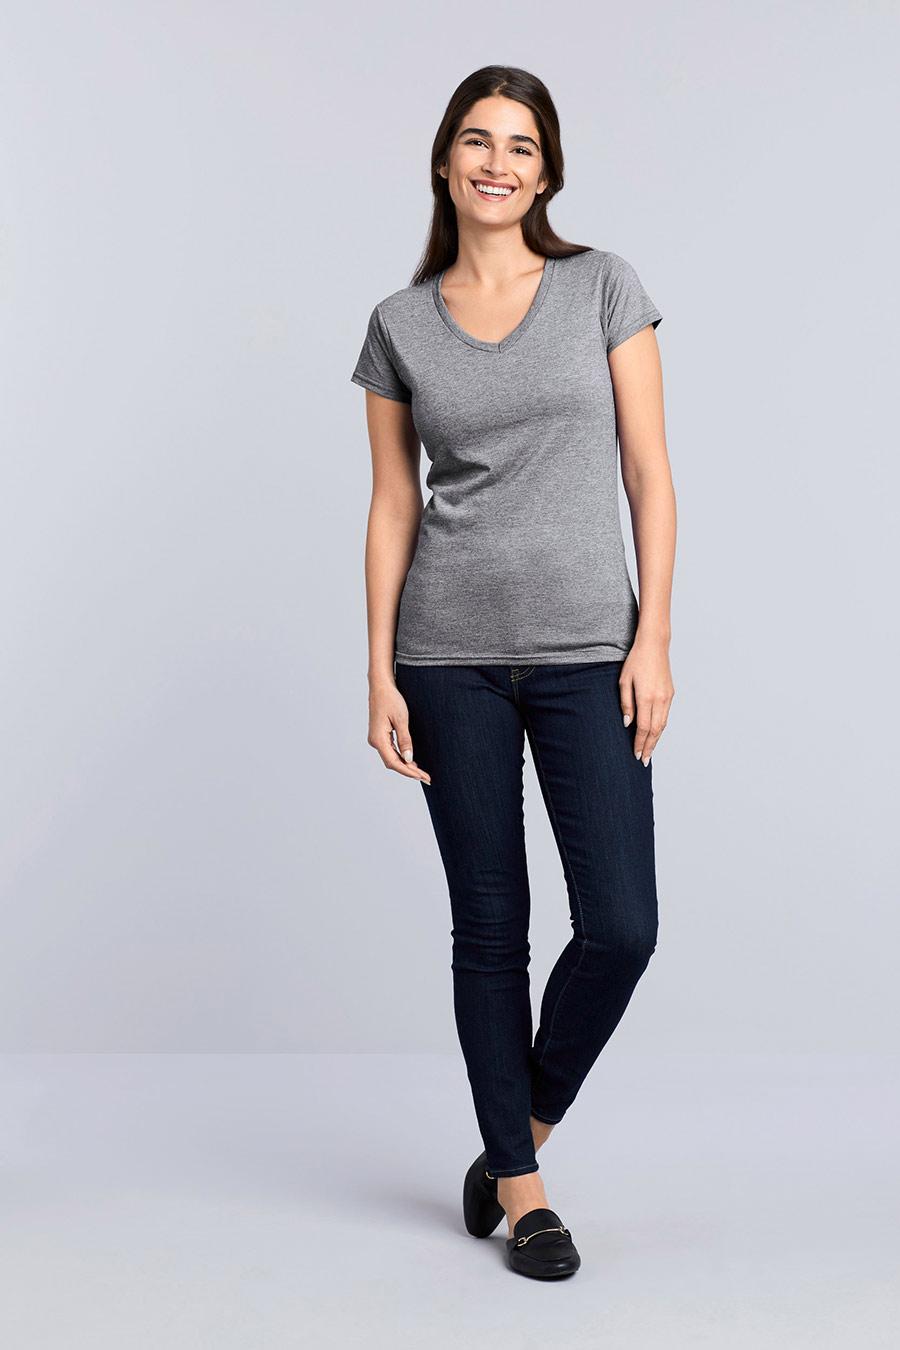 131.09 Softstyle Ladies' T-Shirt 64000L